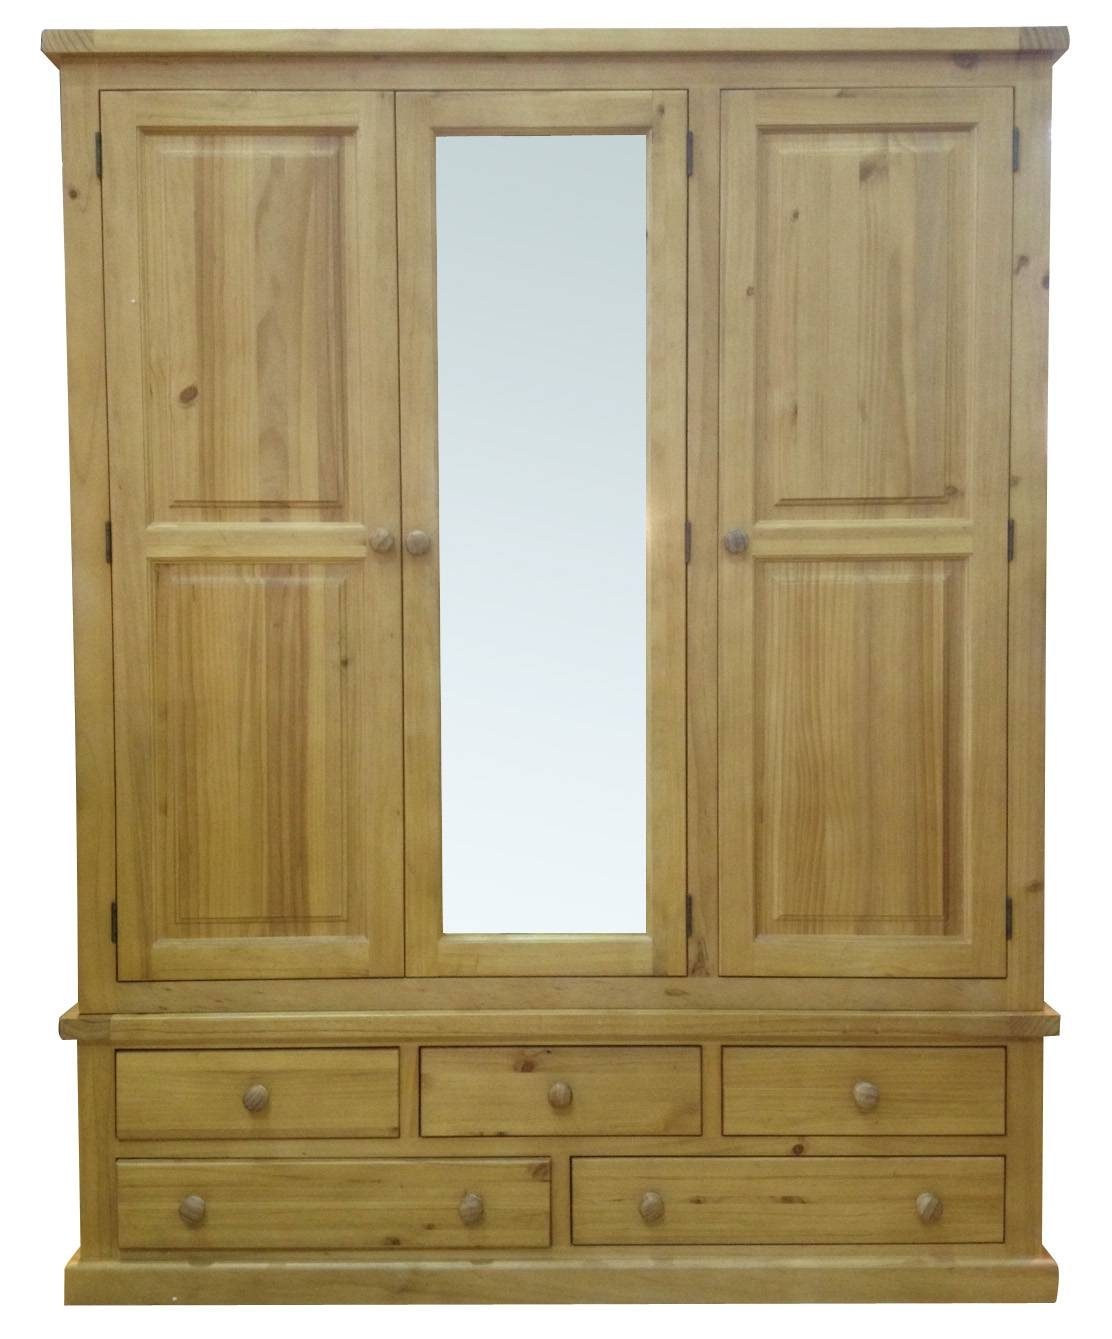 Cotham Large Mirrored 3 Door Pine Wardrobecotham Large Mirrored 3 for 3 Door Pine Wardrobes (Image 6 of 15)